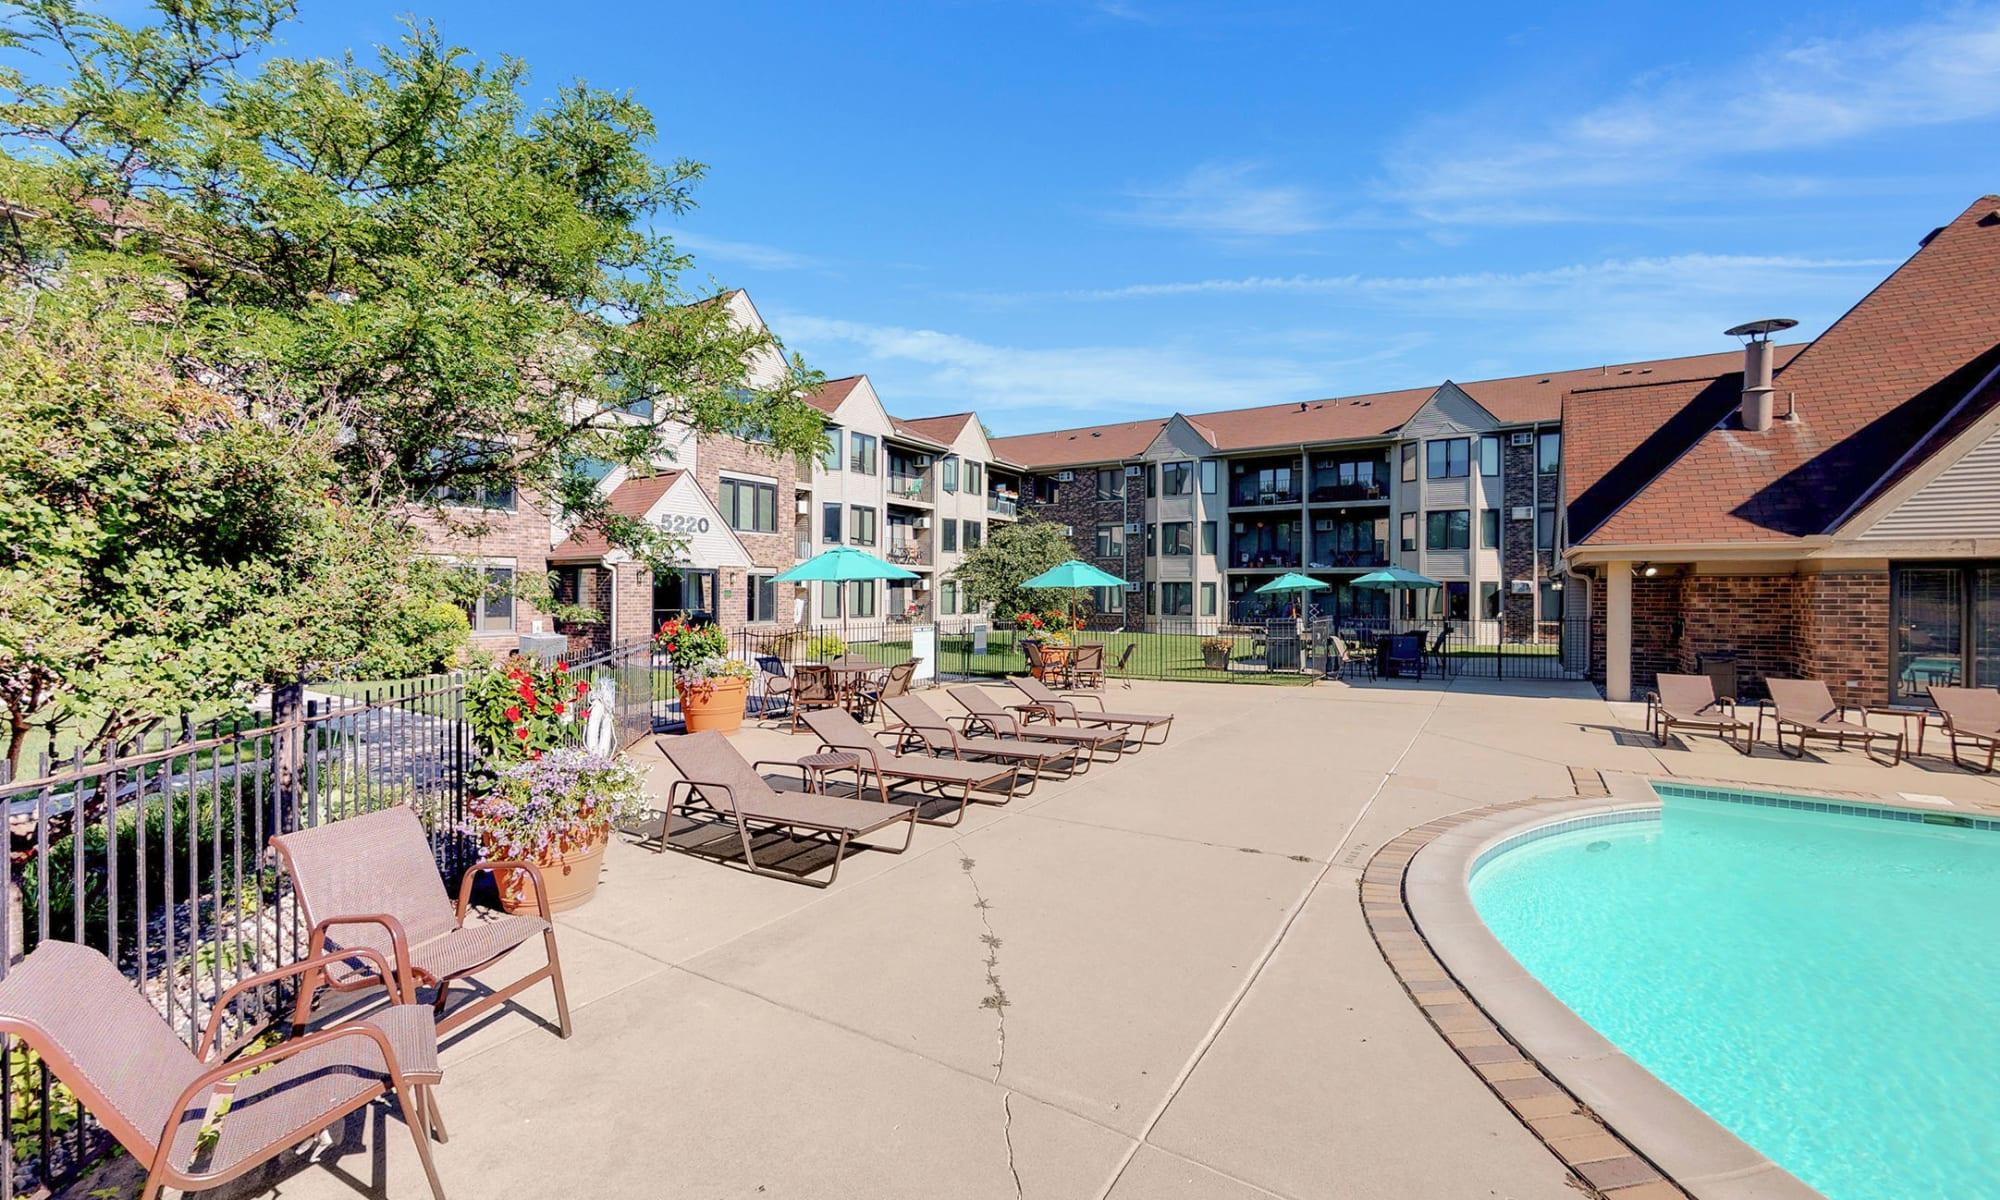 Apartments in Edina, Minnesota at Oaks Lincoln Apartments & Townhomes